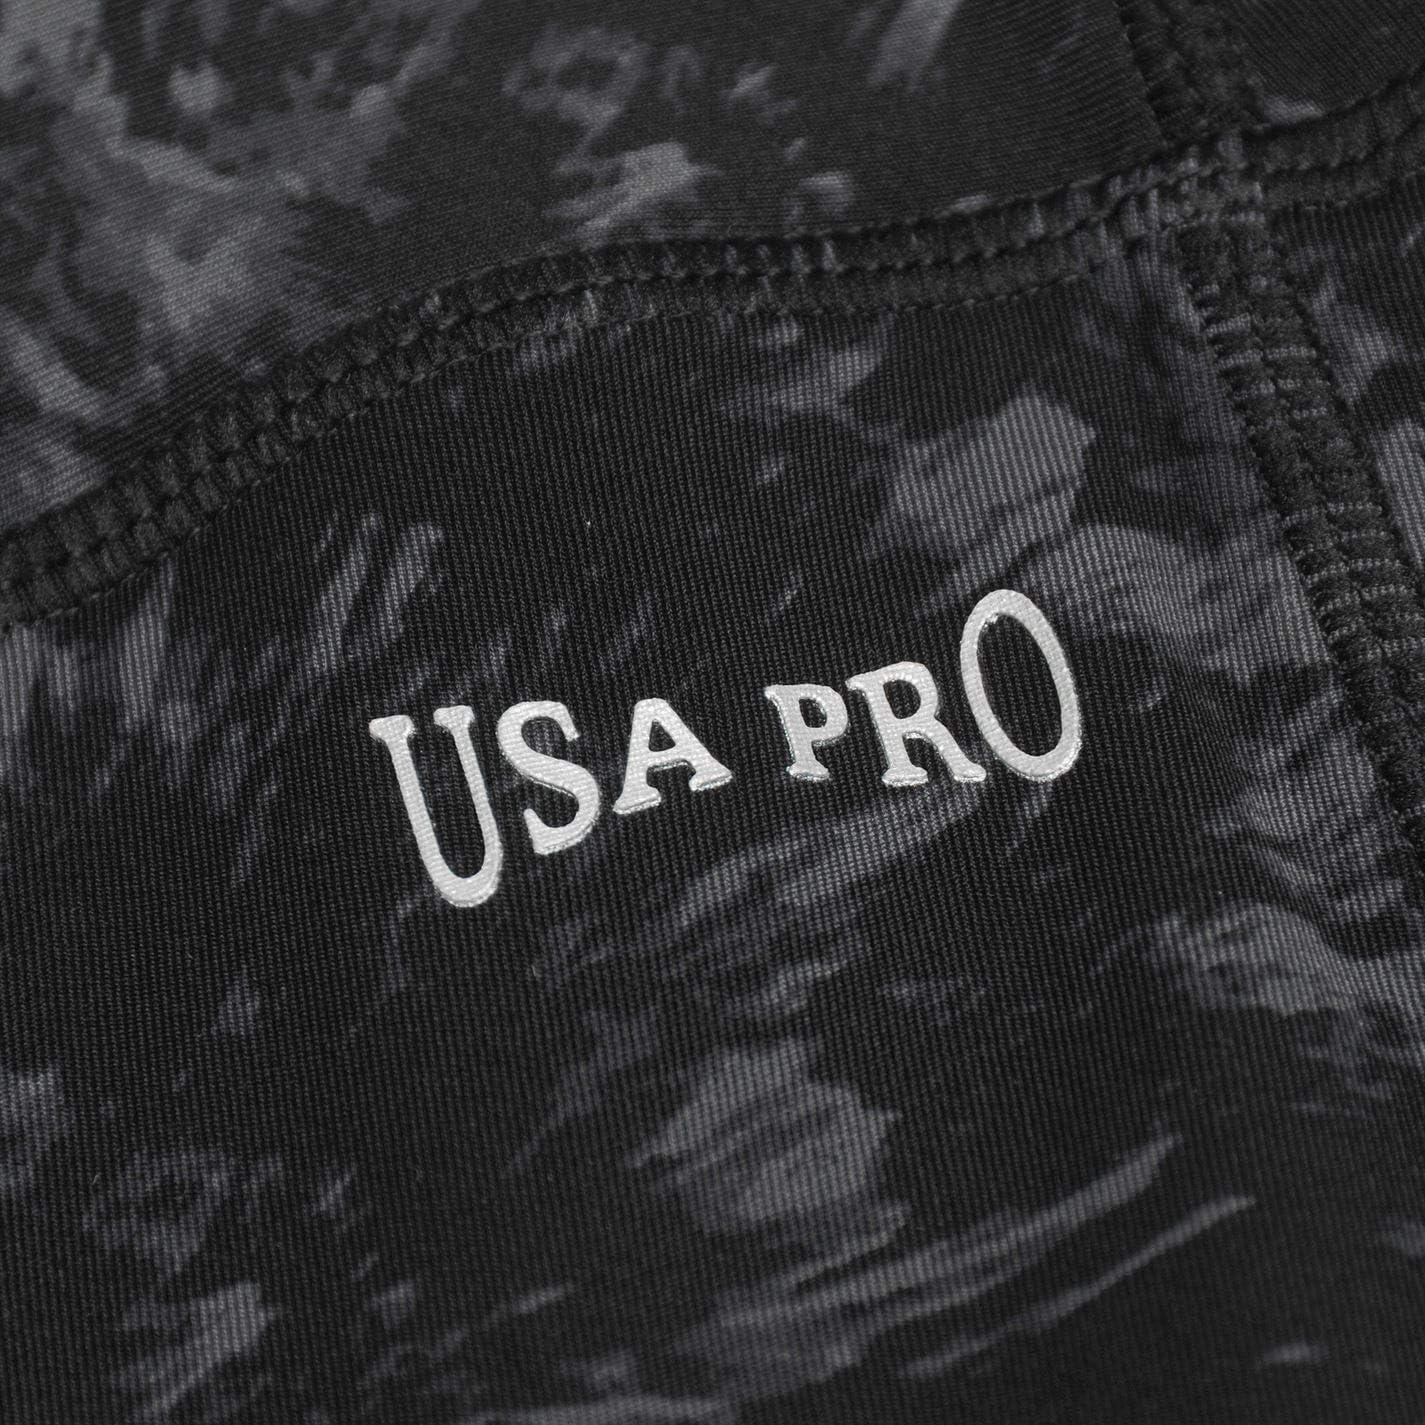 USA Pro Damen Training Leggings Leicht Fitness Sporthose Leicht Trainingshose